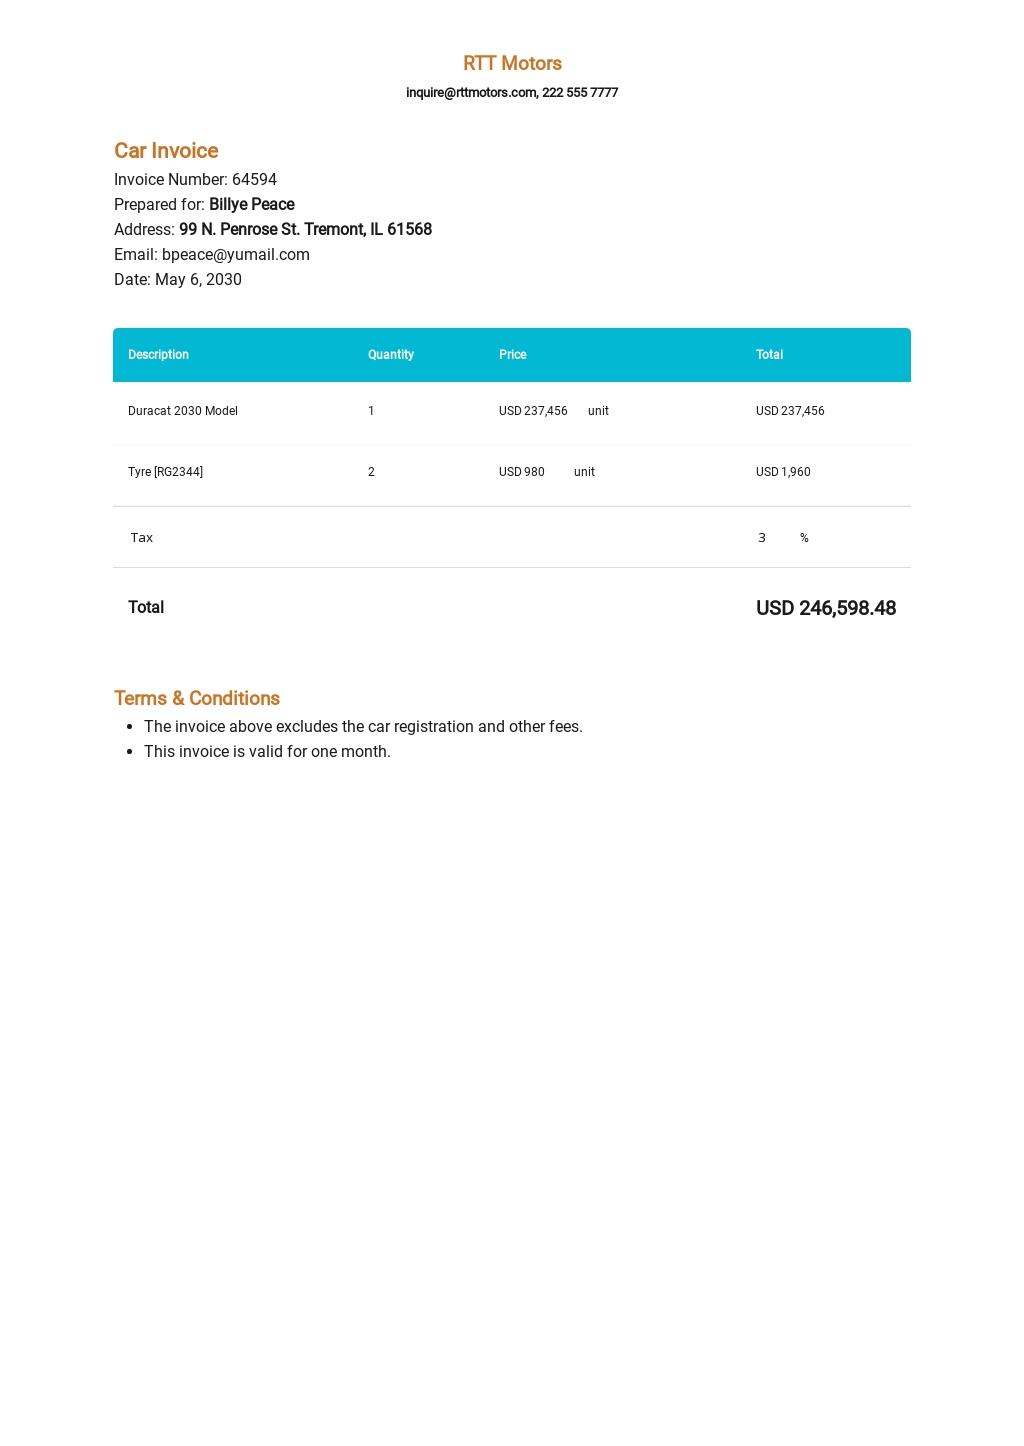 Car Invoice Template [Free PDF] - Google Docs, Google Sheets, Excel, Word